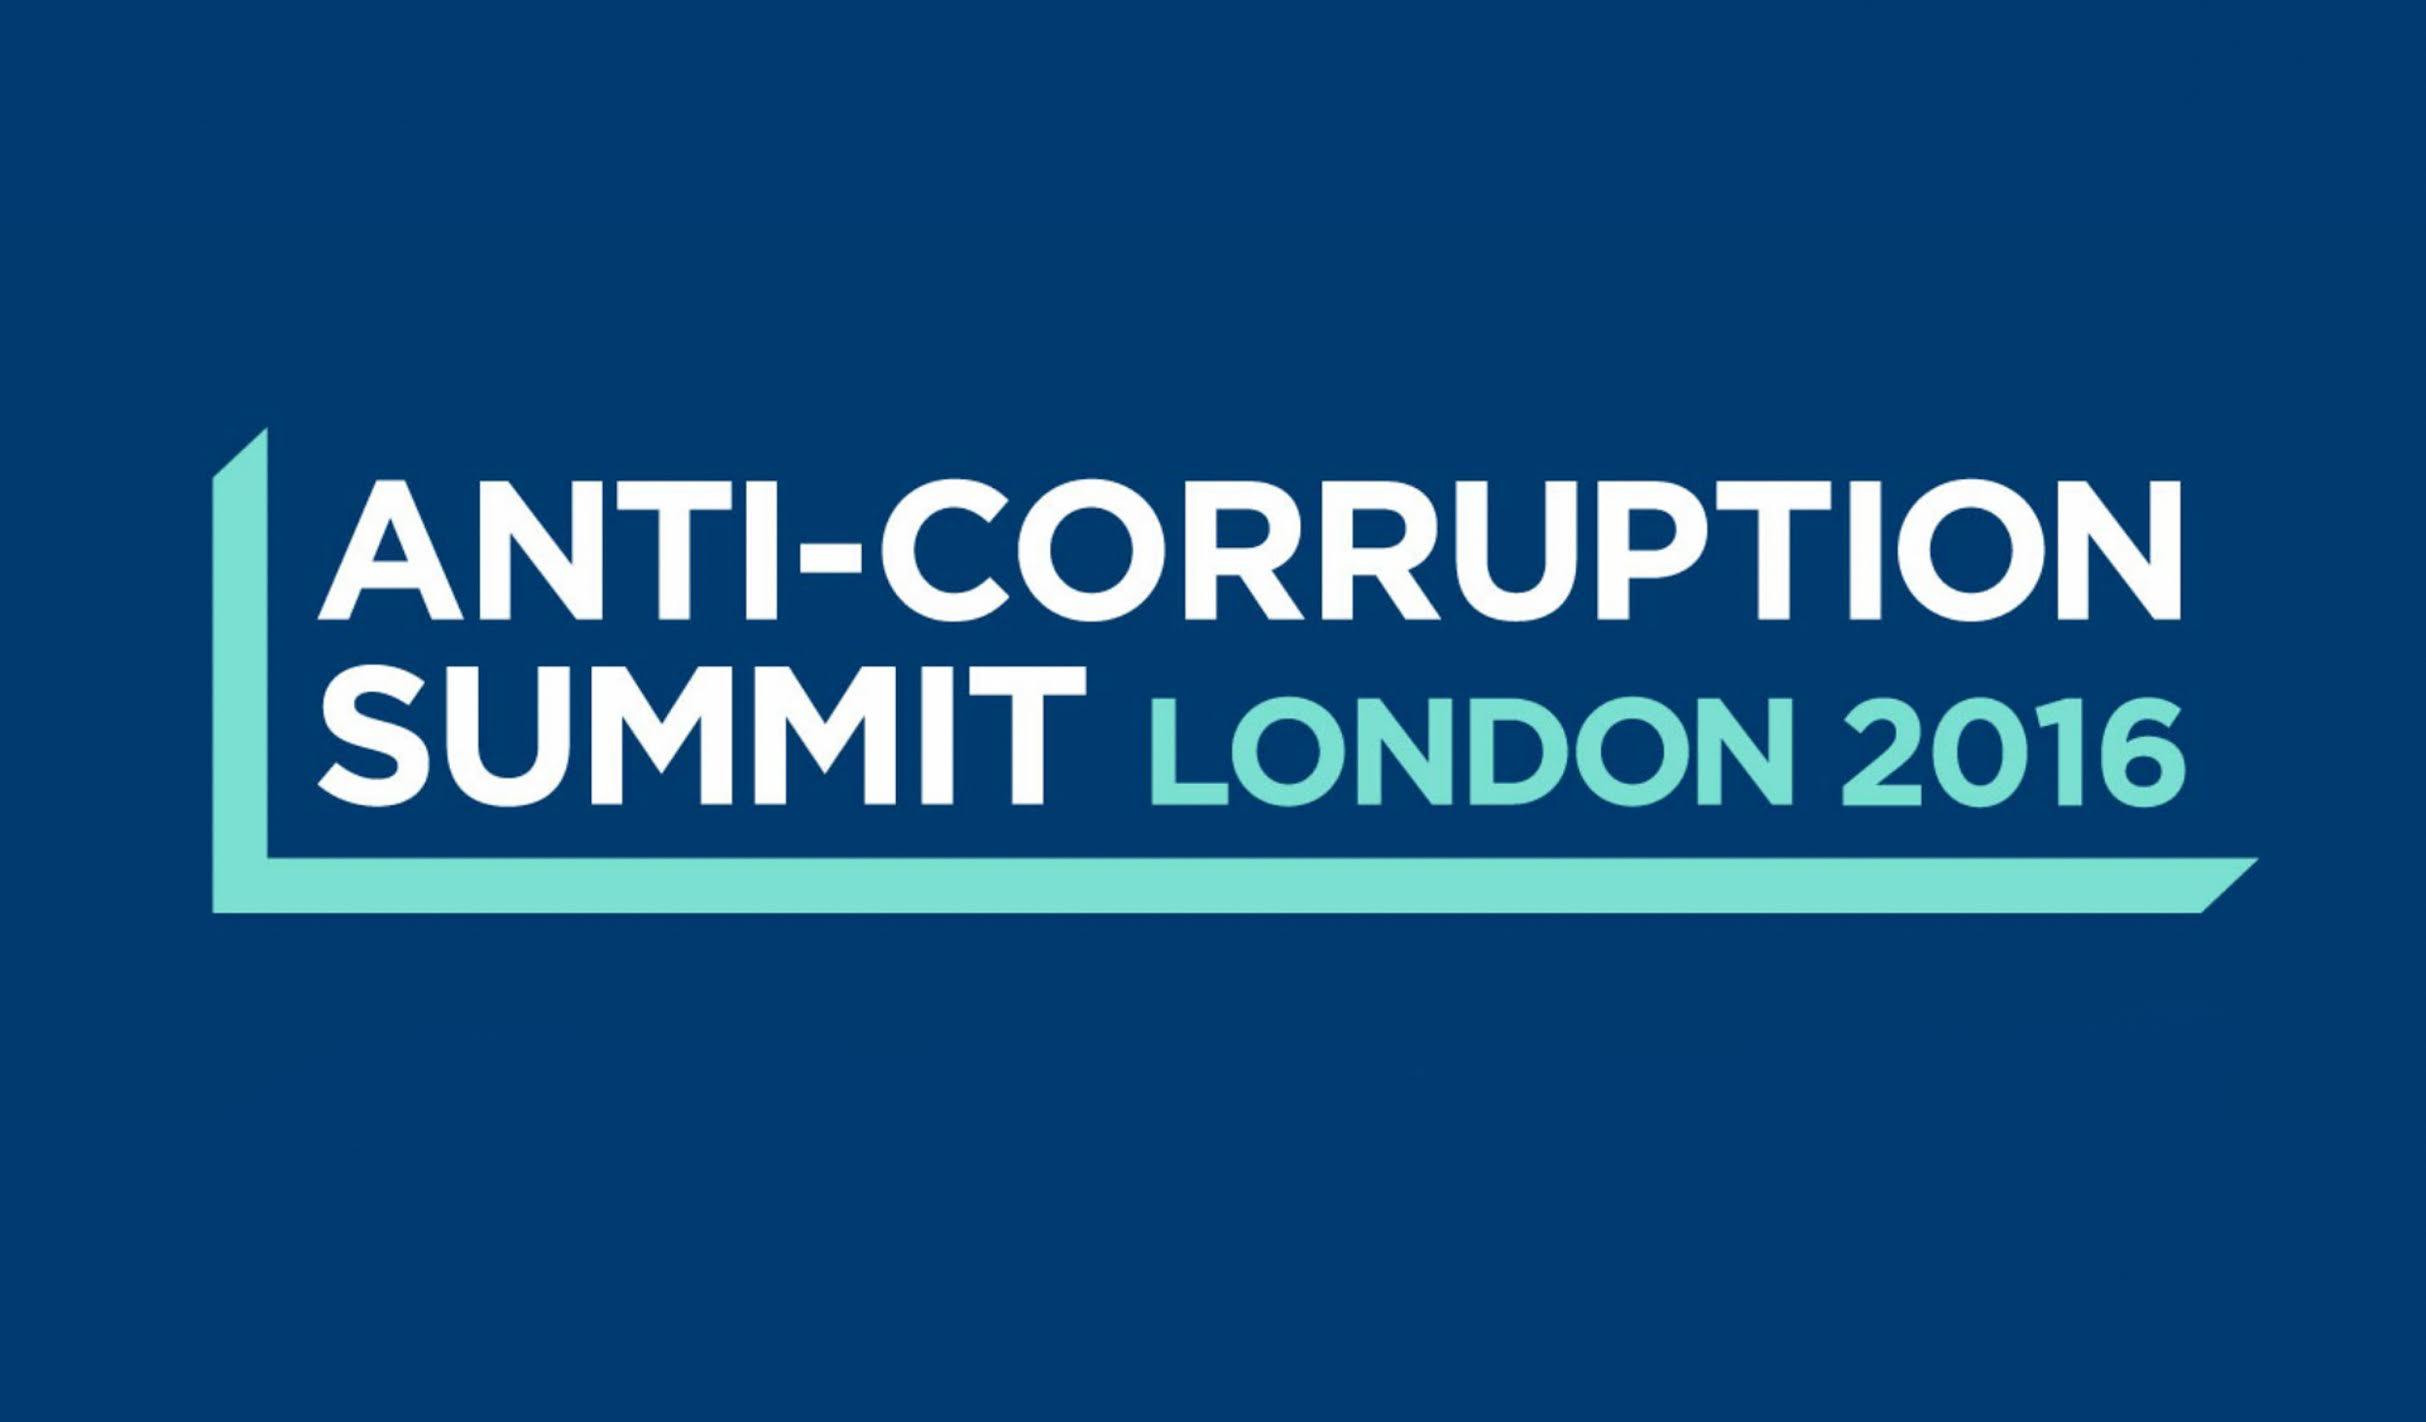 Anti-Corruption Summit London 2016.